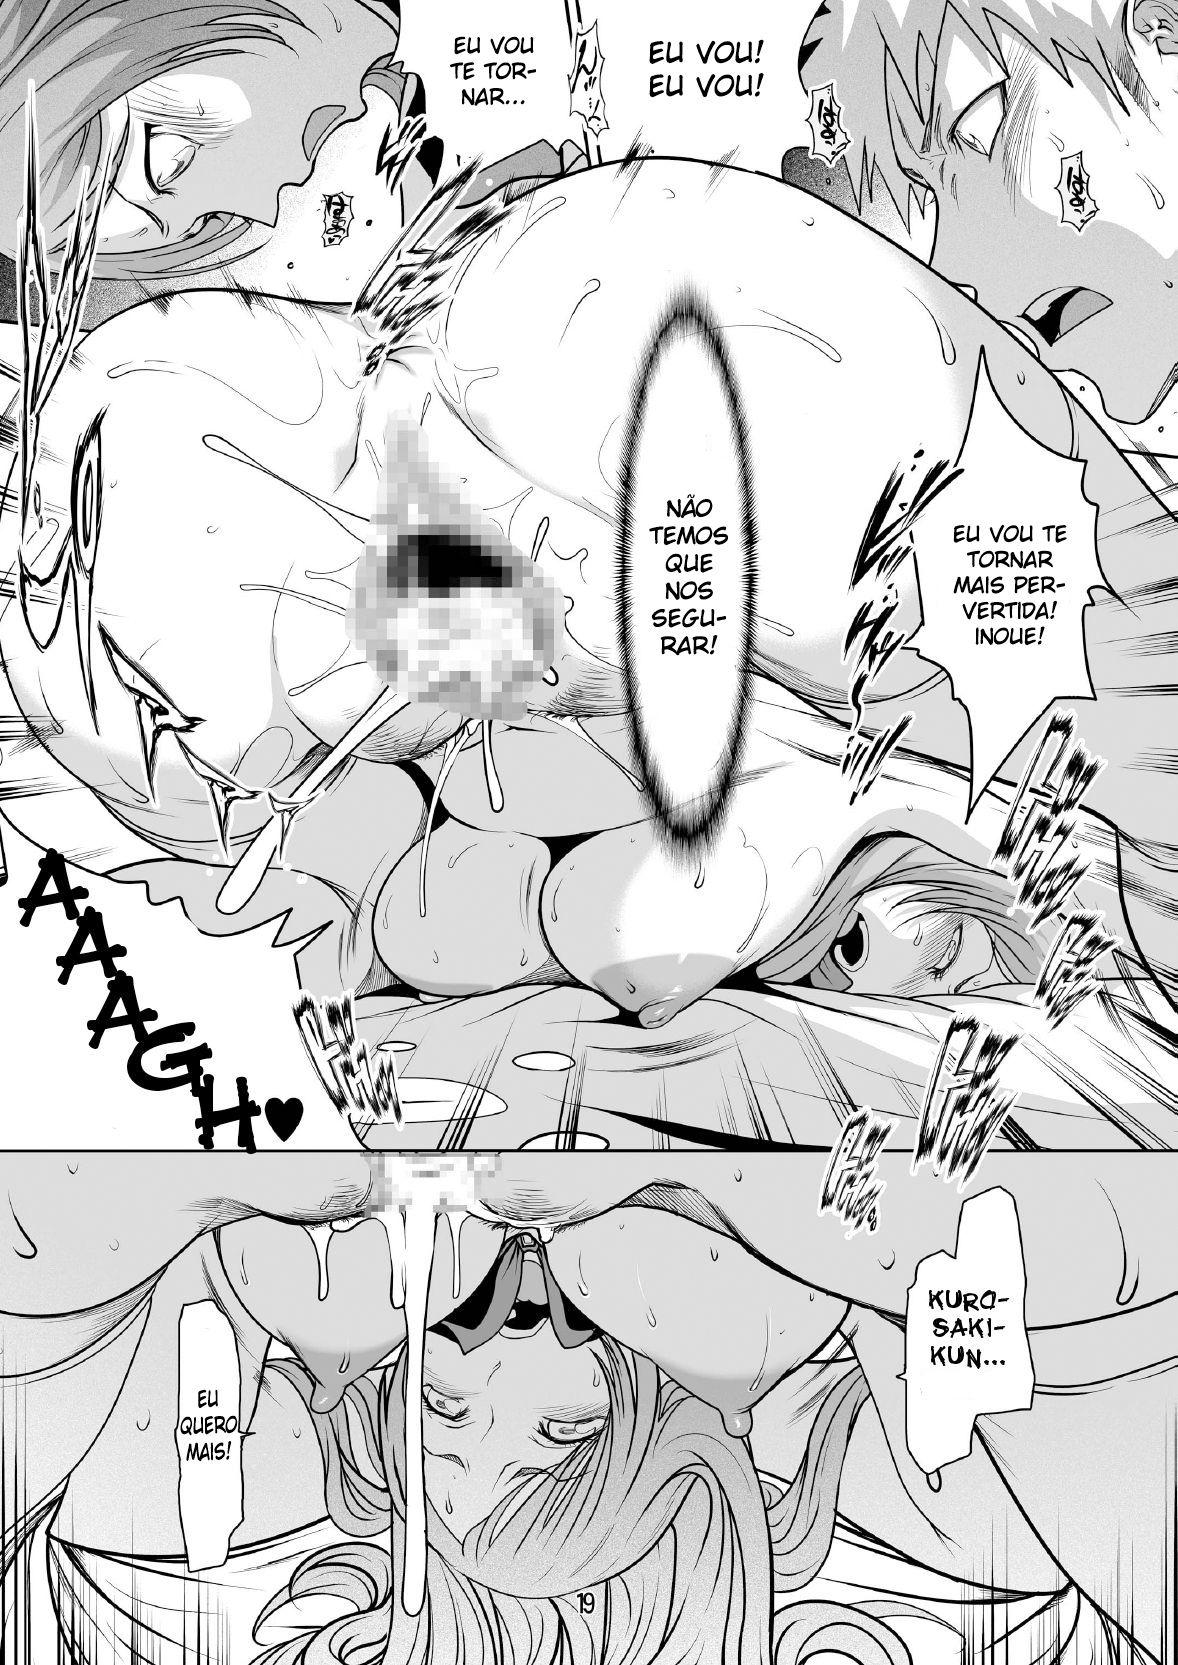 Breach-Pornô-Inoue-pervertida-17